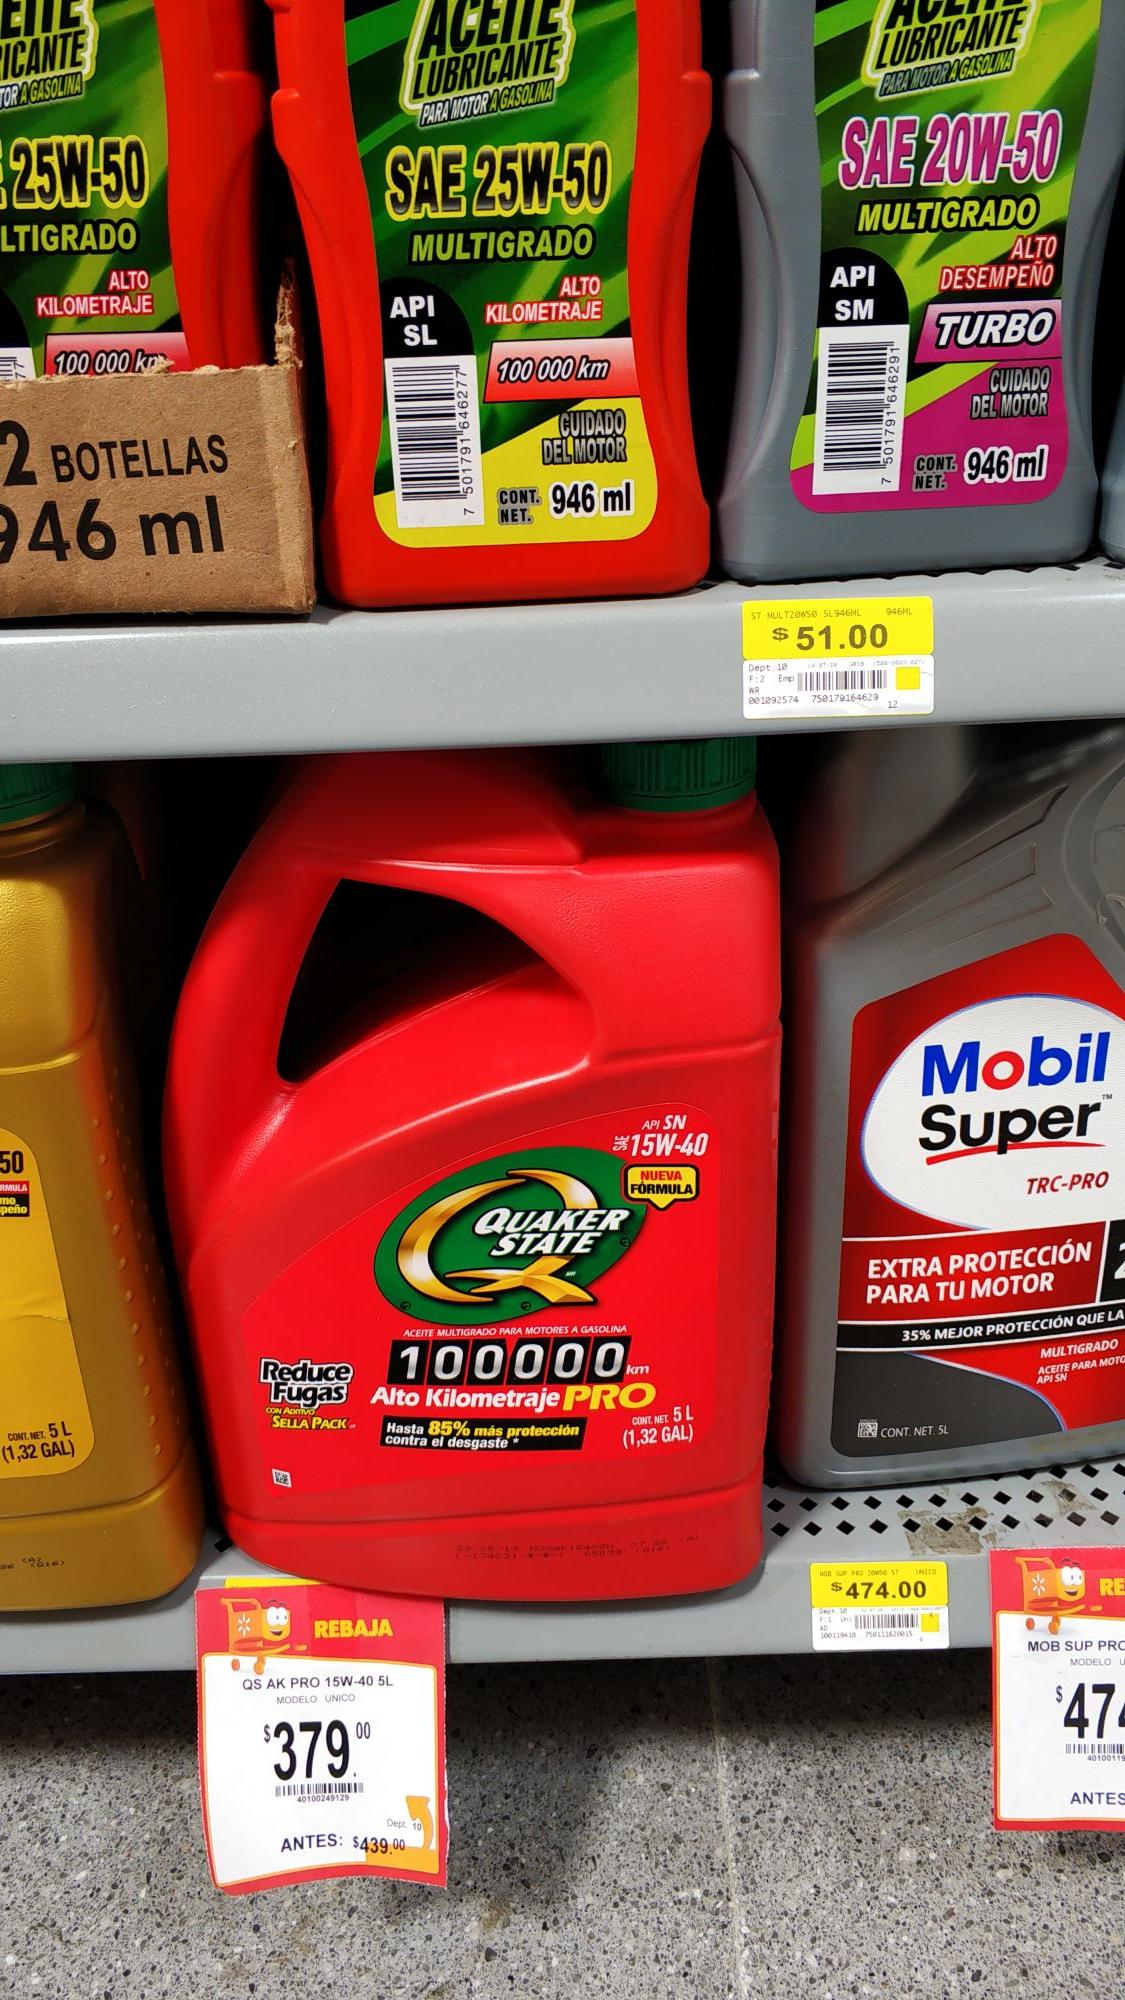 Walmart galon 5lts de Aceite para motor gasolina